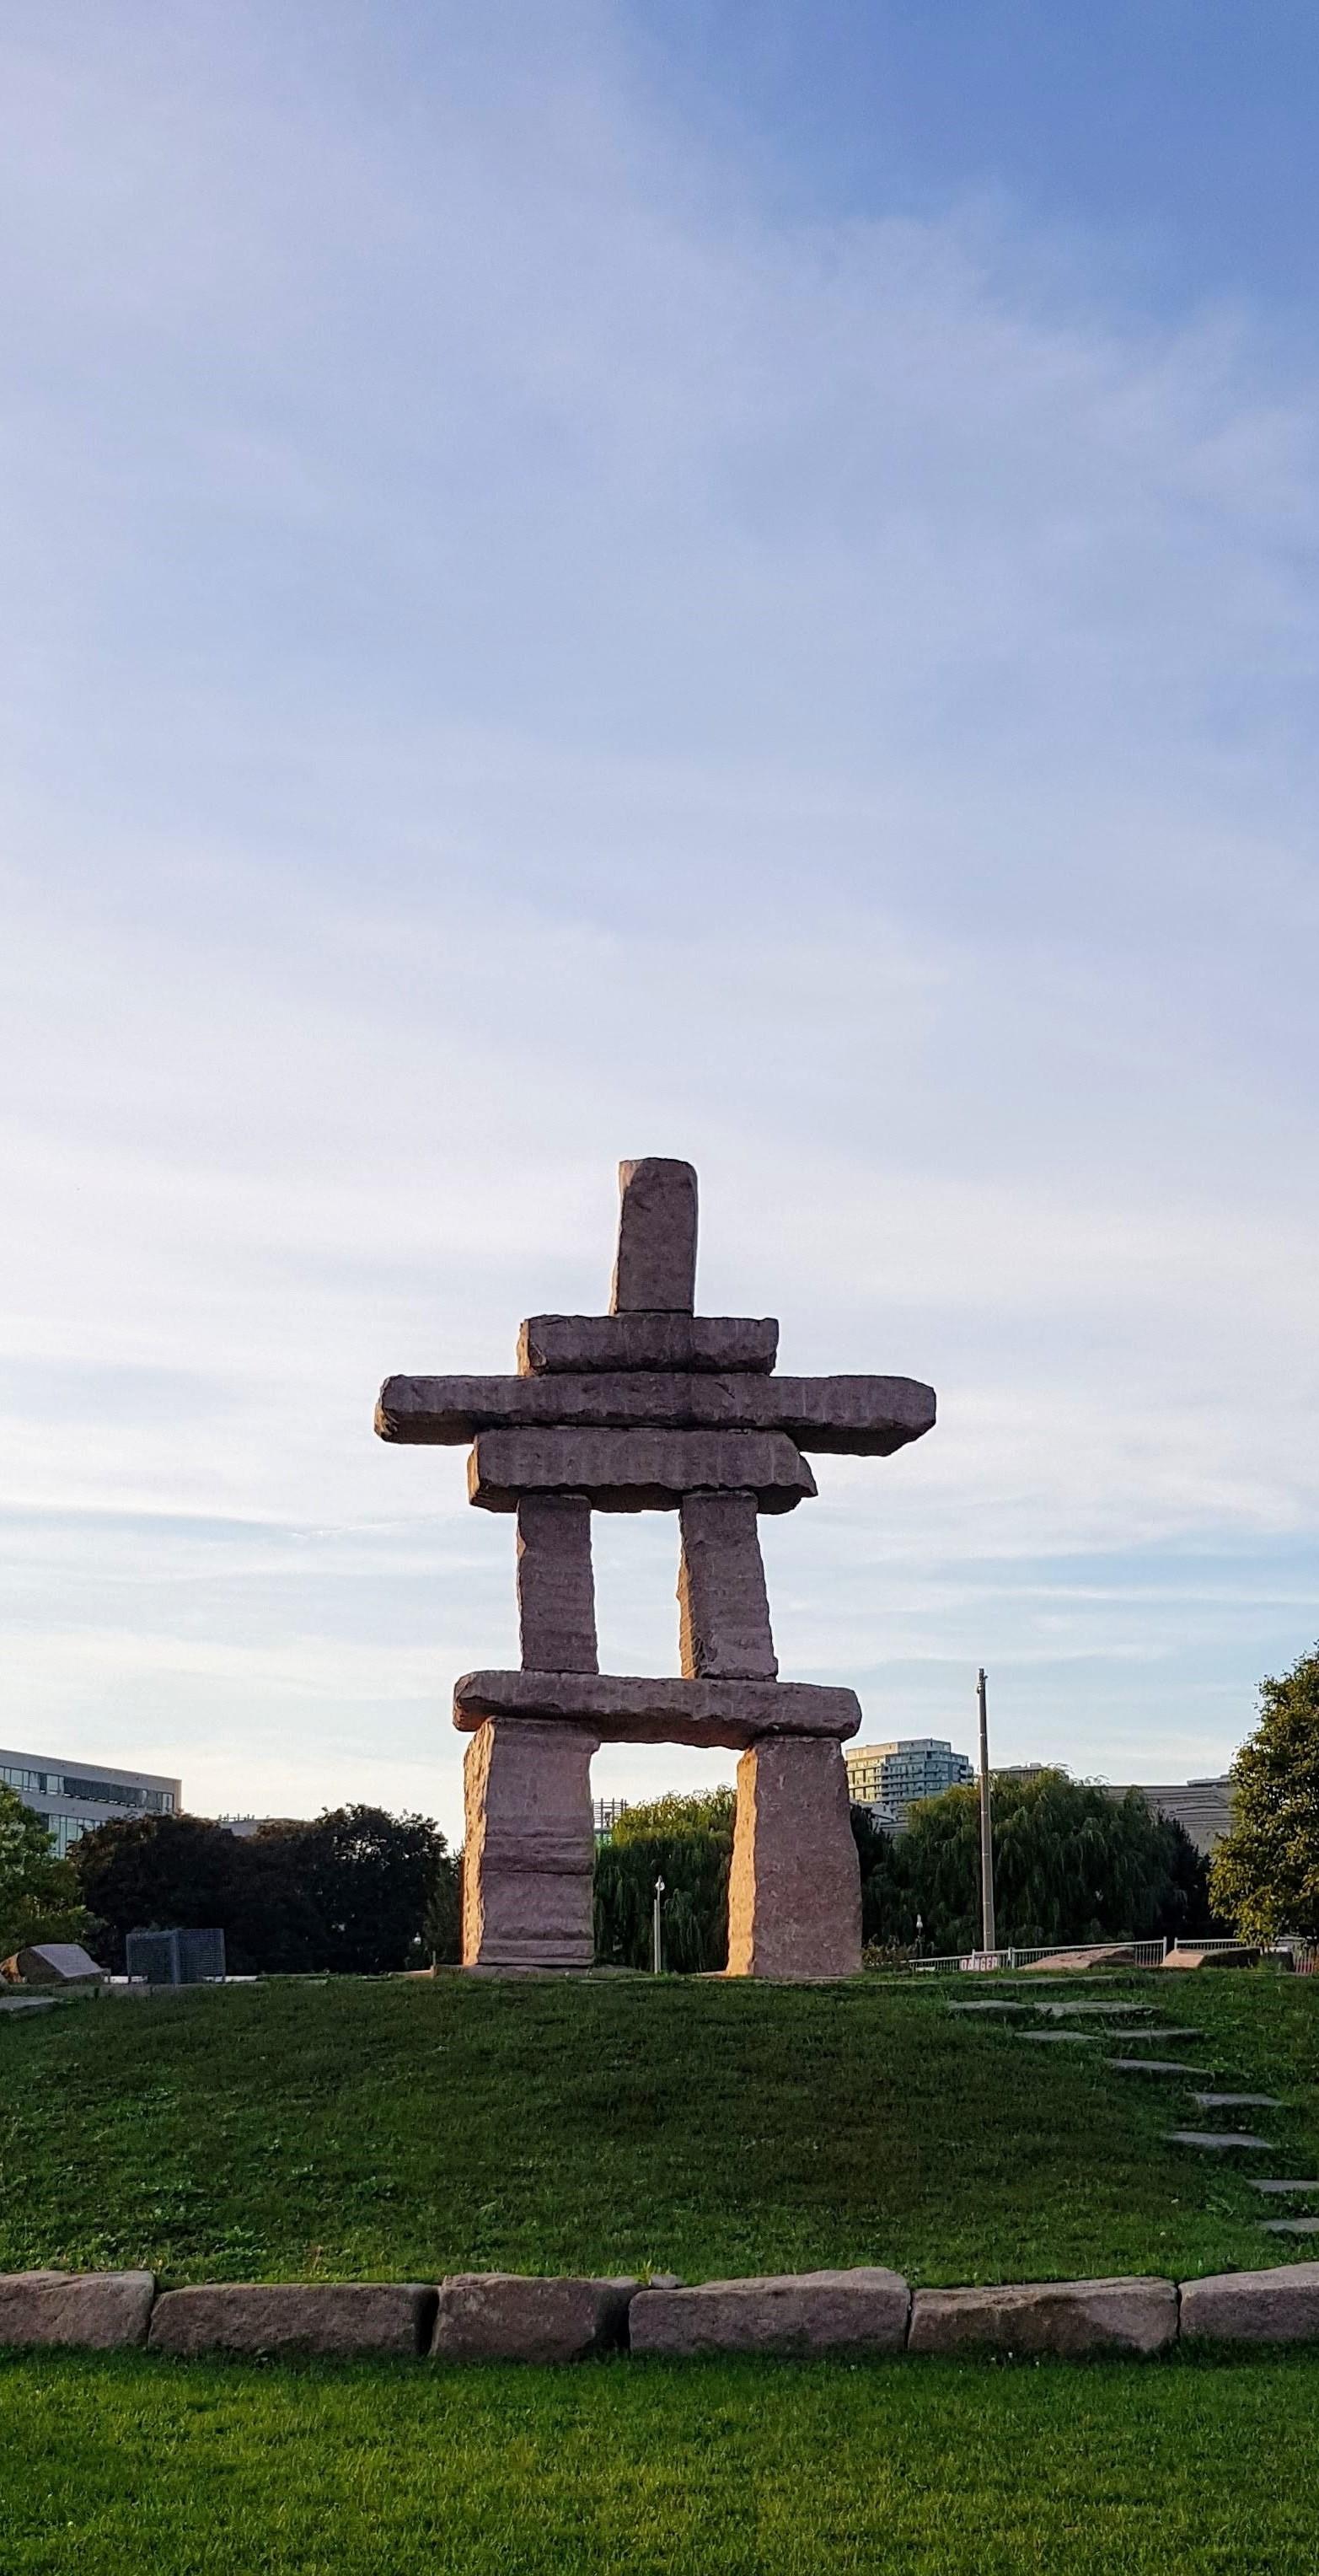 Inidigenous symbol